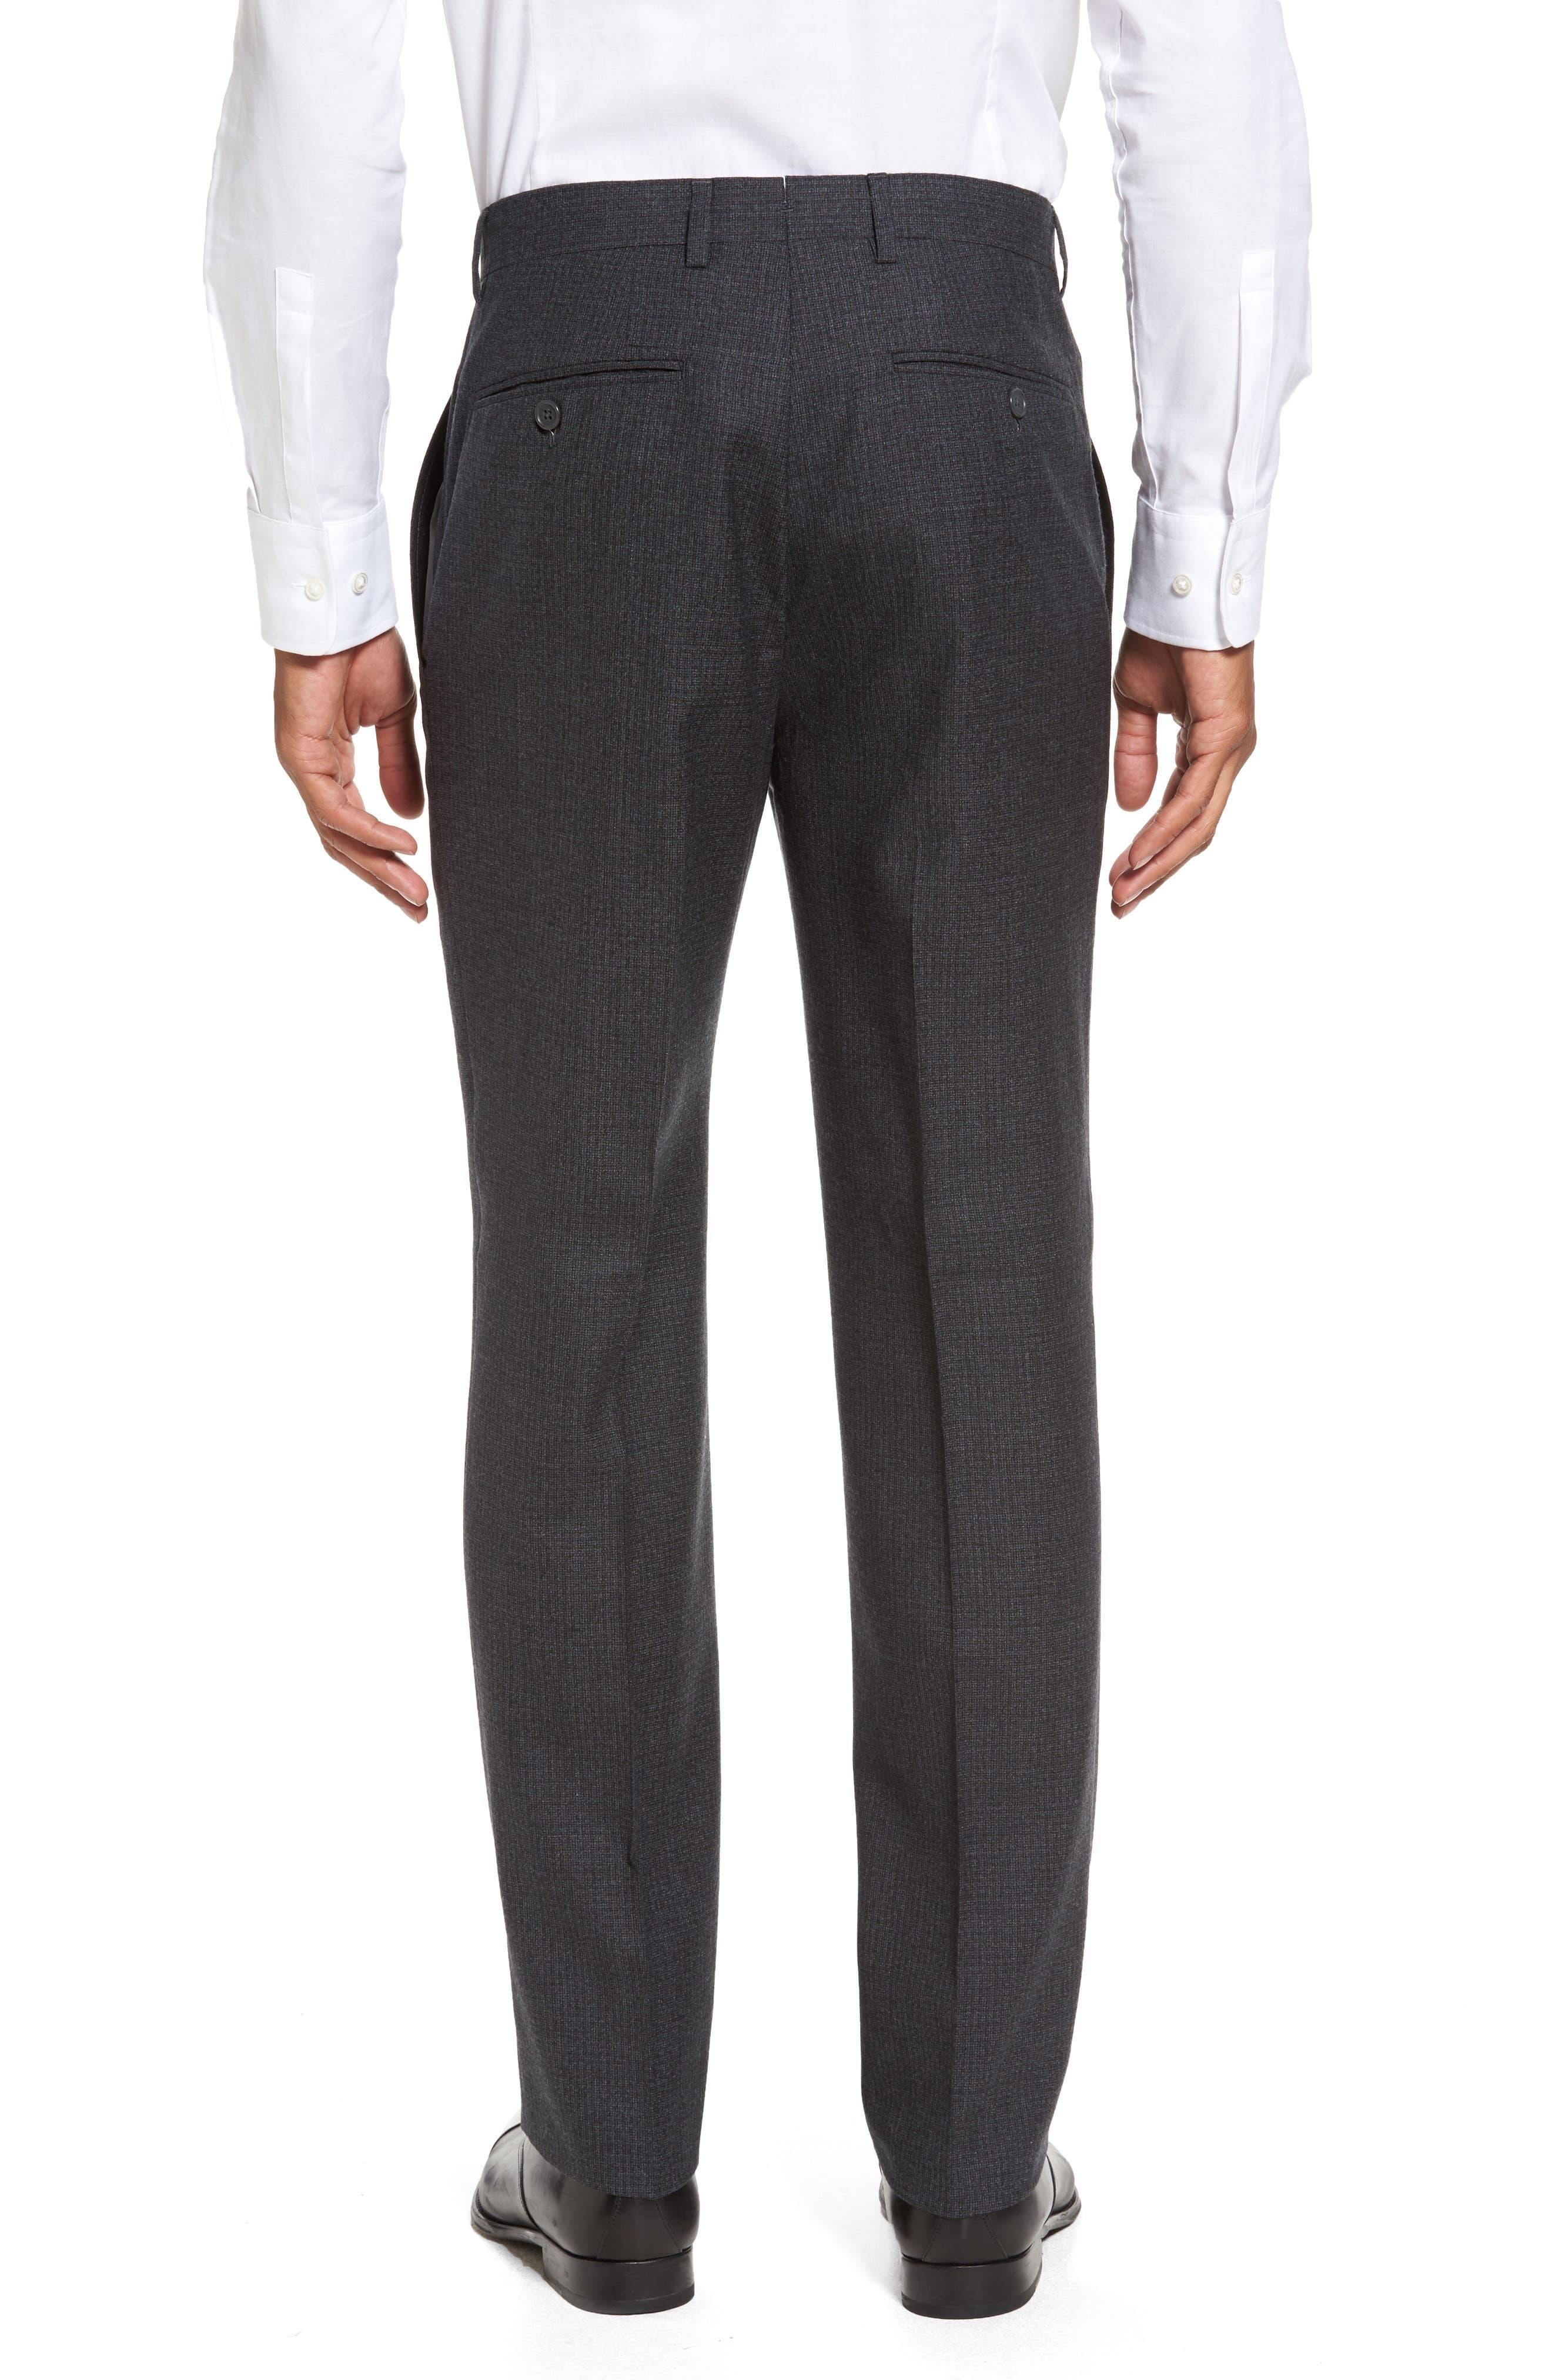 Romero Regular Fit Flat Front Trousers,                             Alternate thumbnail 3, color,                             010